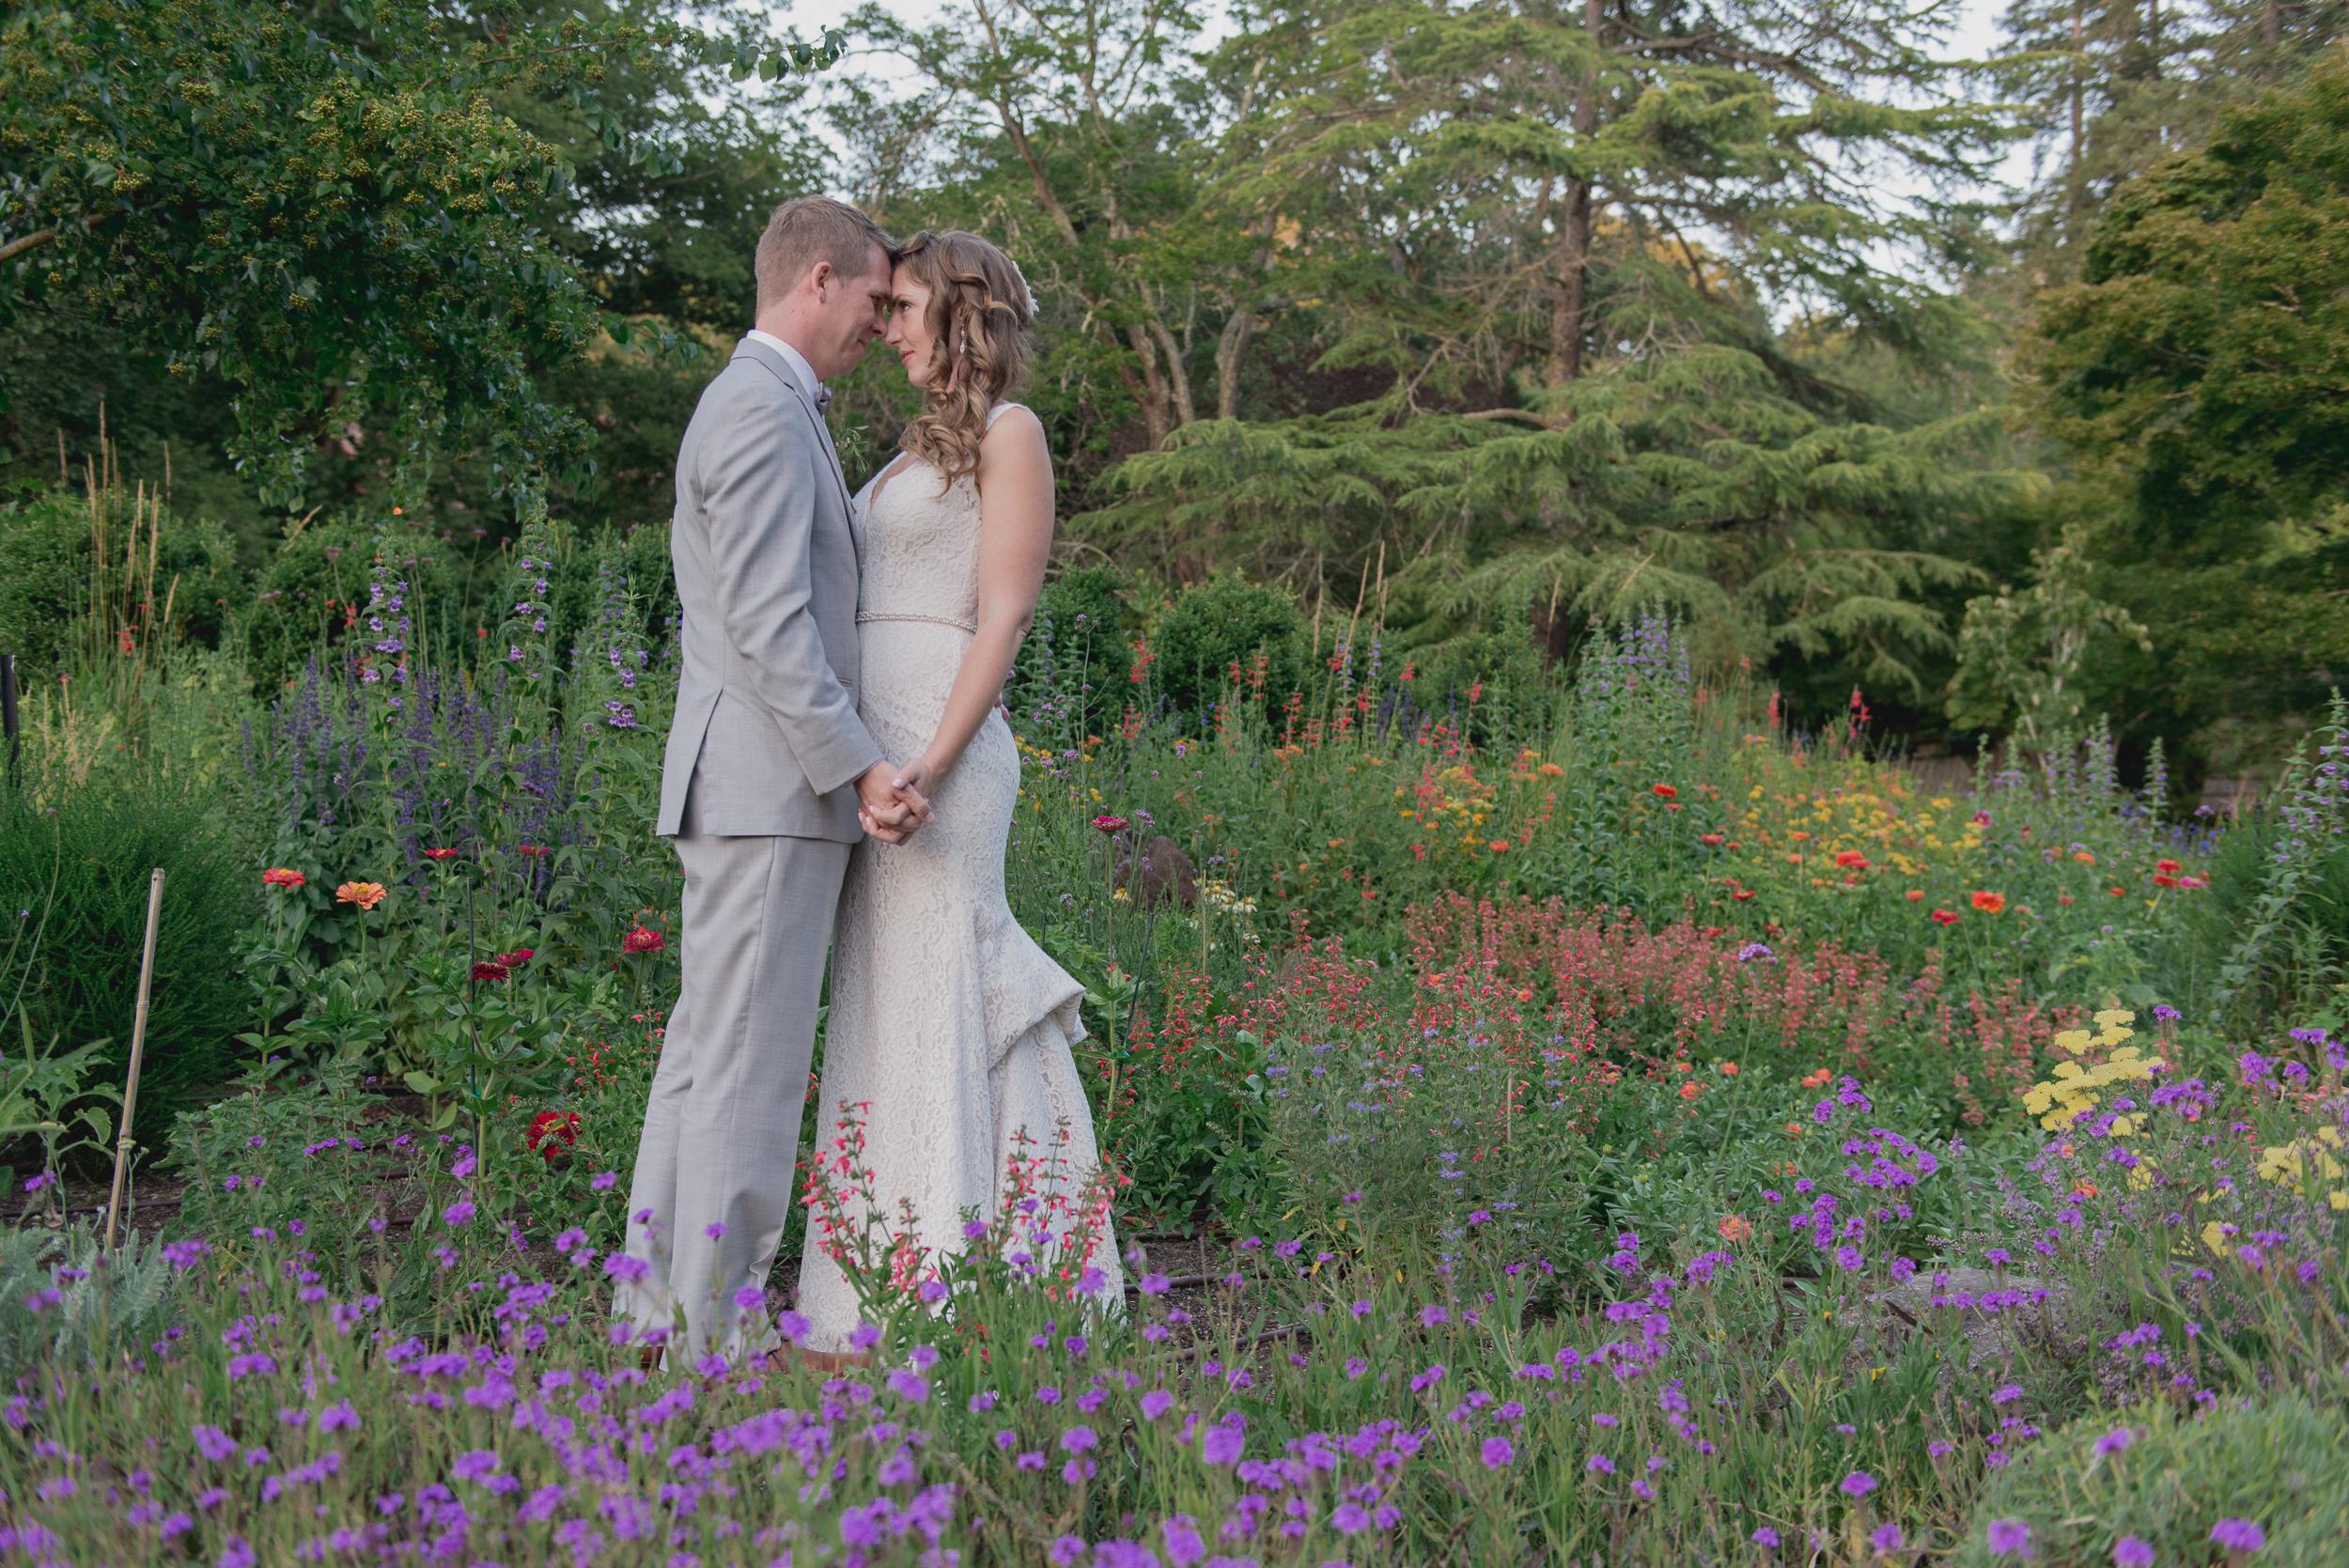 53-down-to-earth-marin-art-garden-center-wedding-vivianchen.jpg